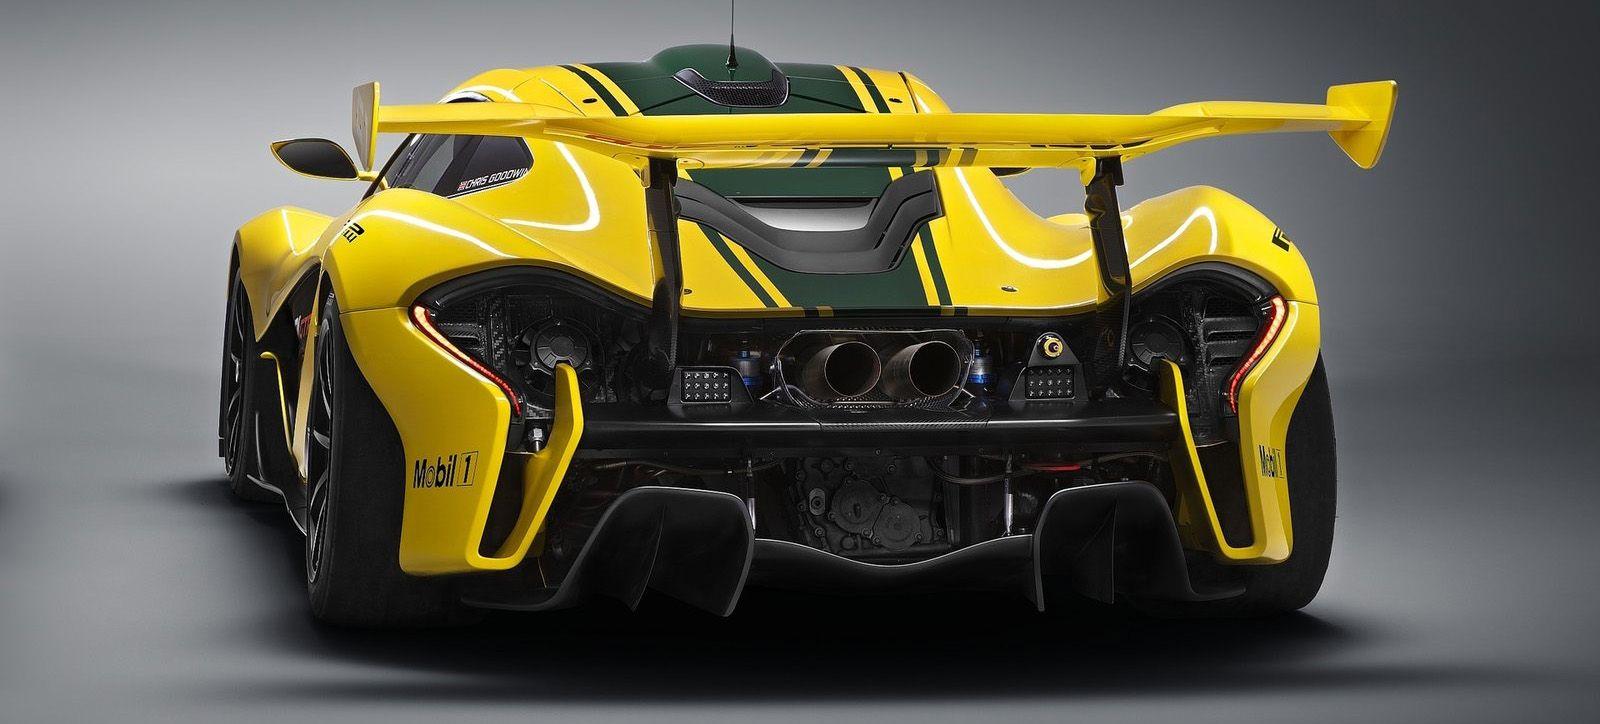 Mclaren P1 Spoiler - Supercars Gallery